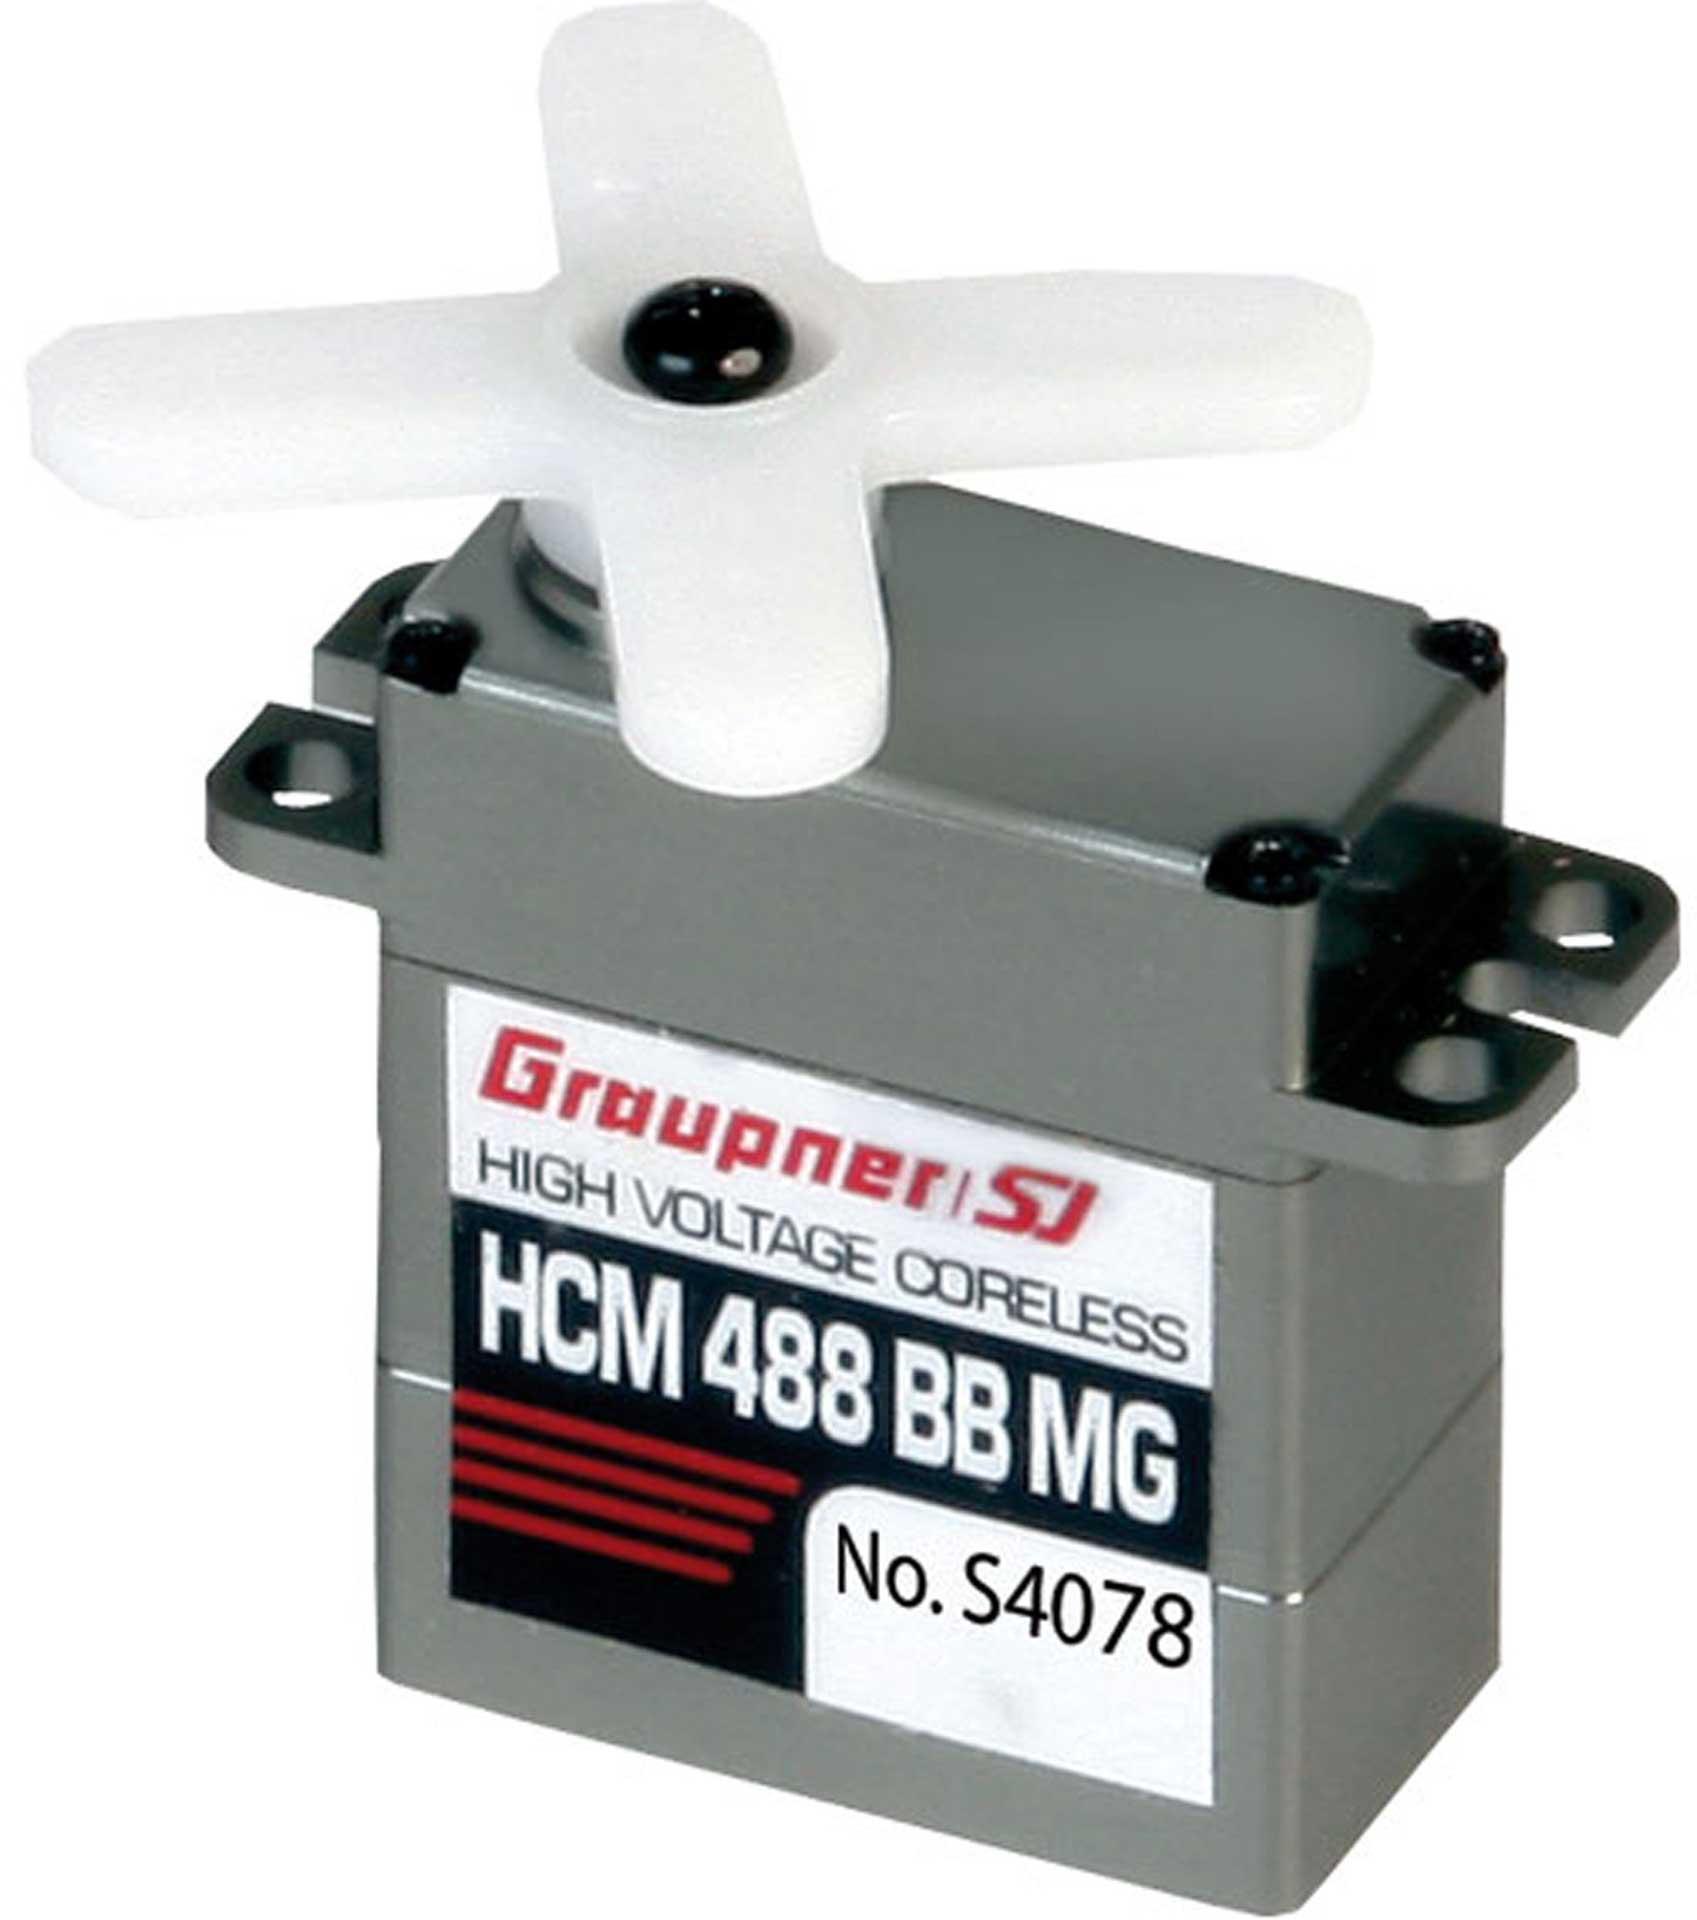 GRAUPNER HCM 488 BB MG DIGI HV SERVO